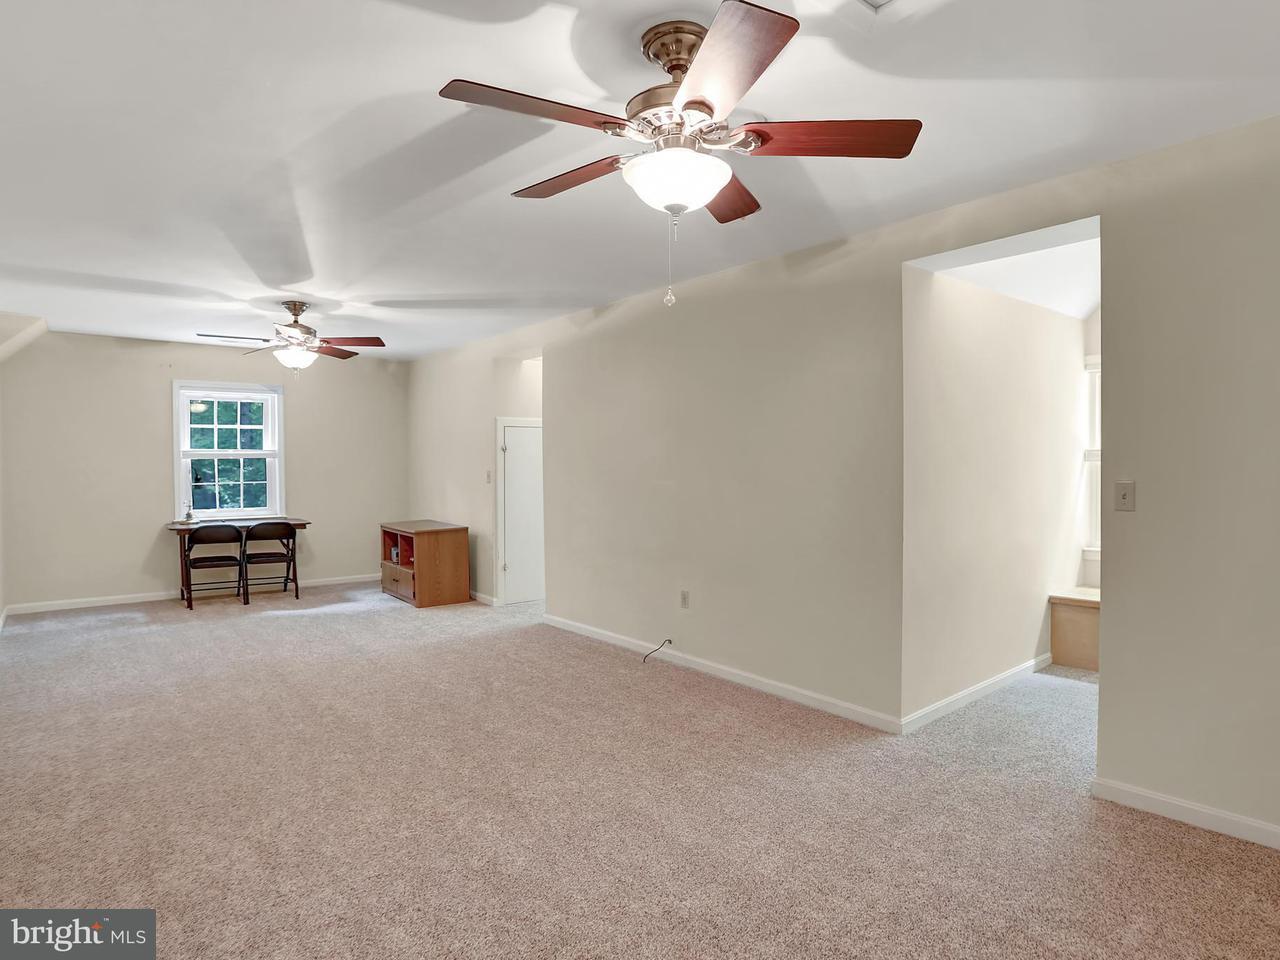 Additional photo for property listing at 12851 LONG GUN Drive 12851 LONG GUN Drive Dunkirk, Maryland 20754 Estados Unidos